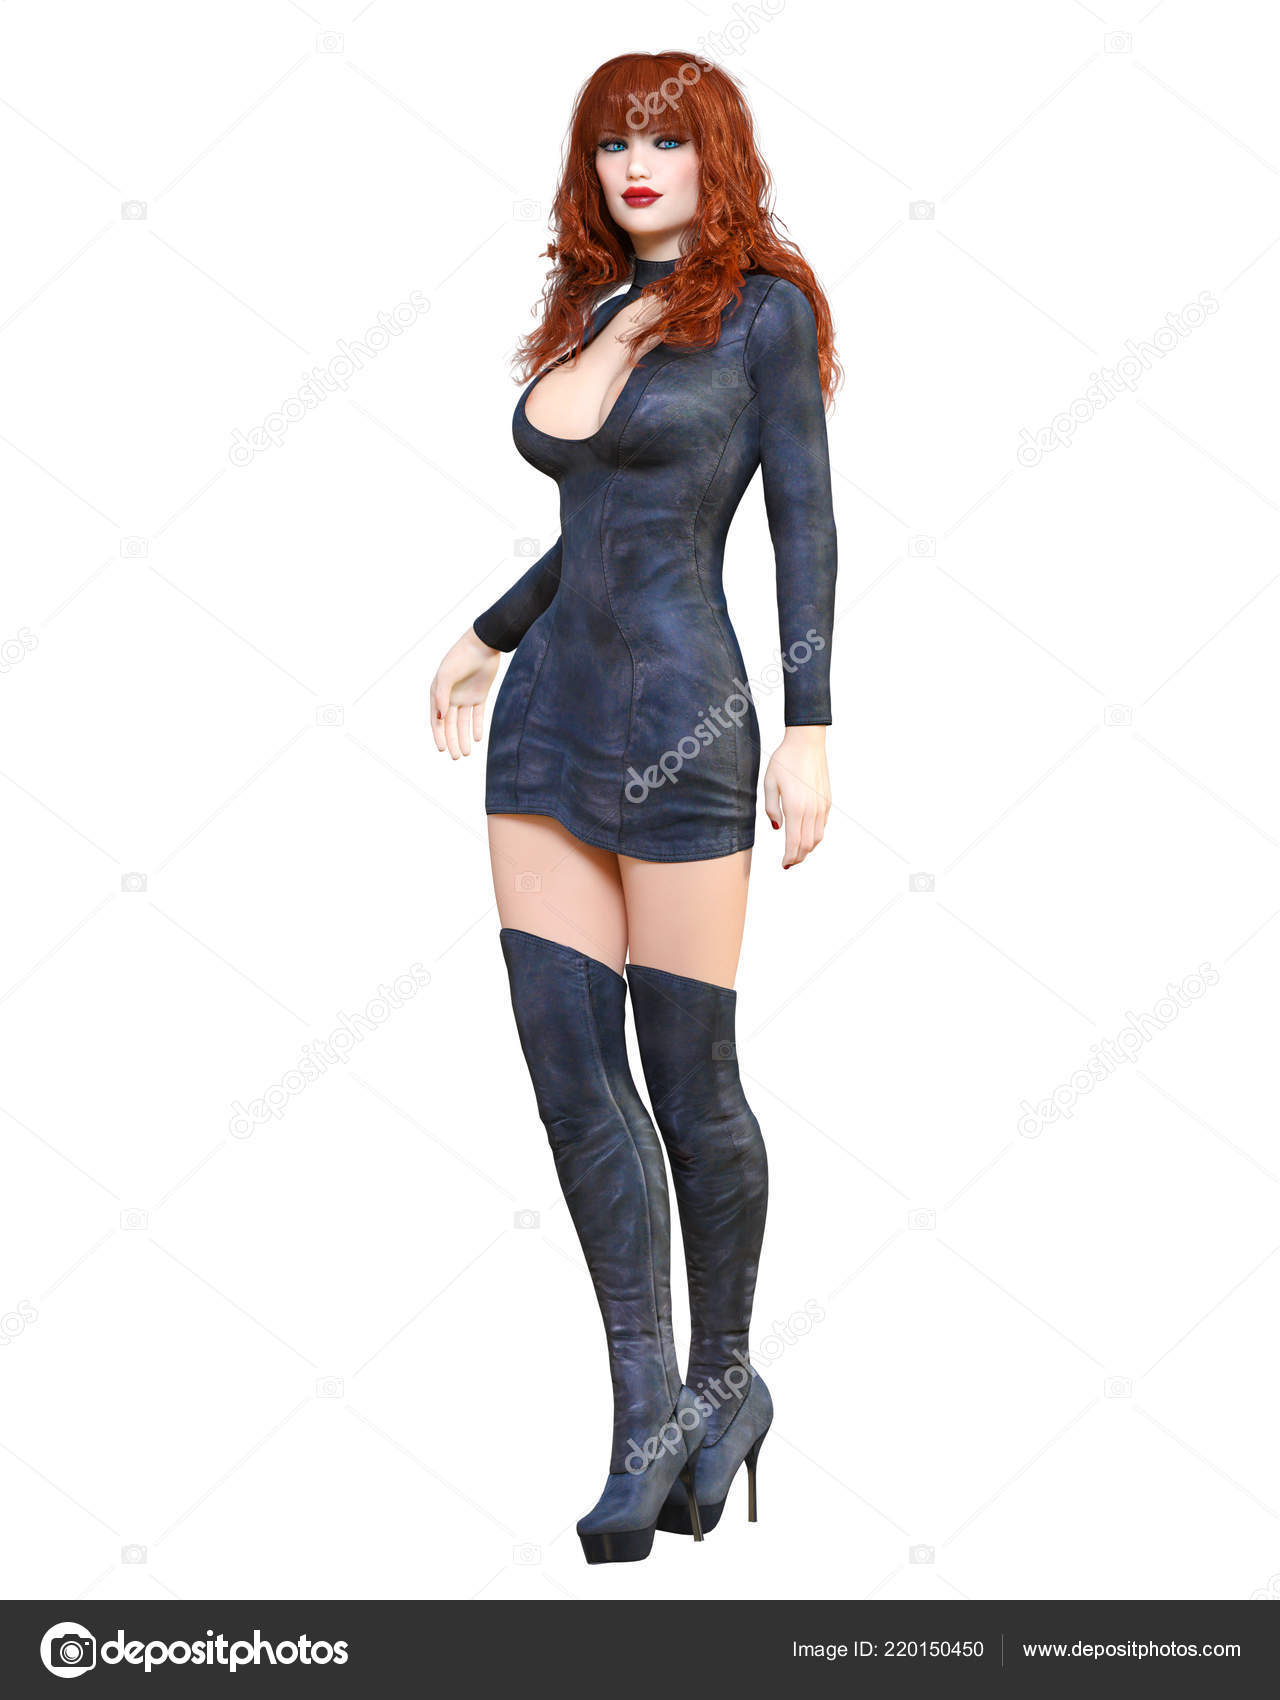 7892a778526c depositphotos 220150450-stock-photo-beautiful-woman-black-short-leather.jpg